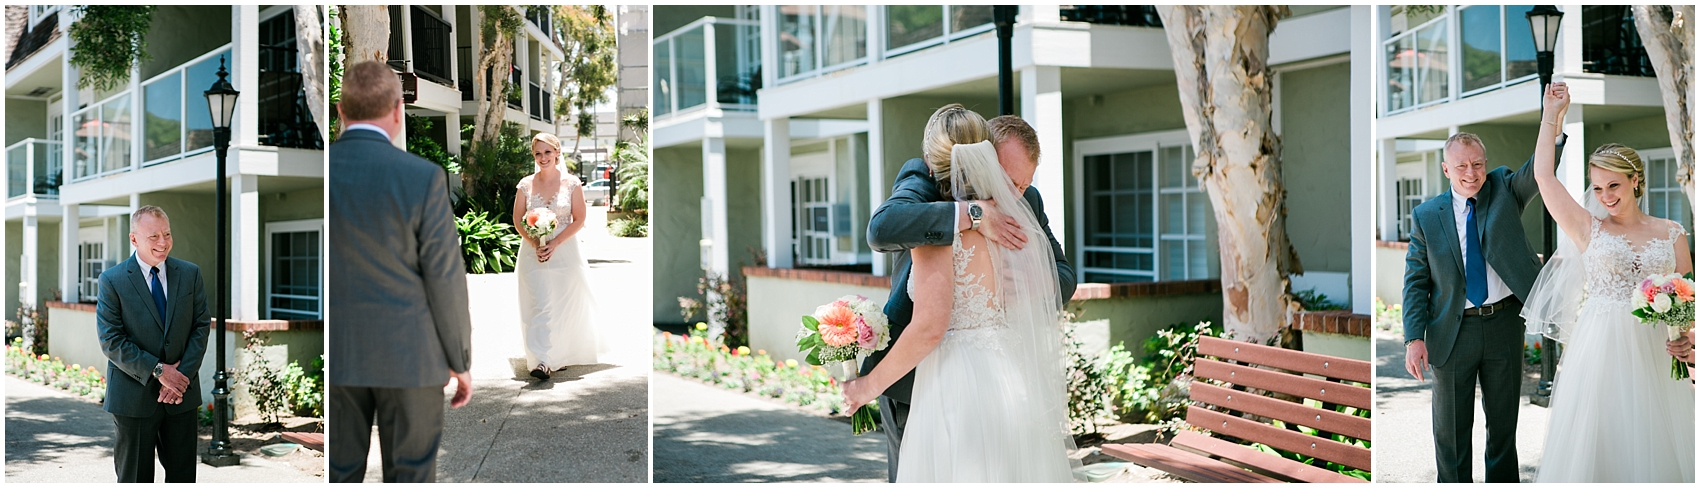 Jen and Mark's Wedding-0082.jpg